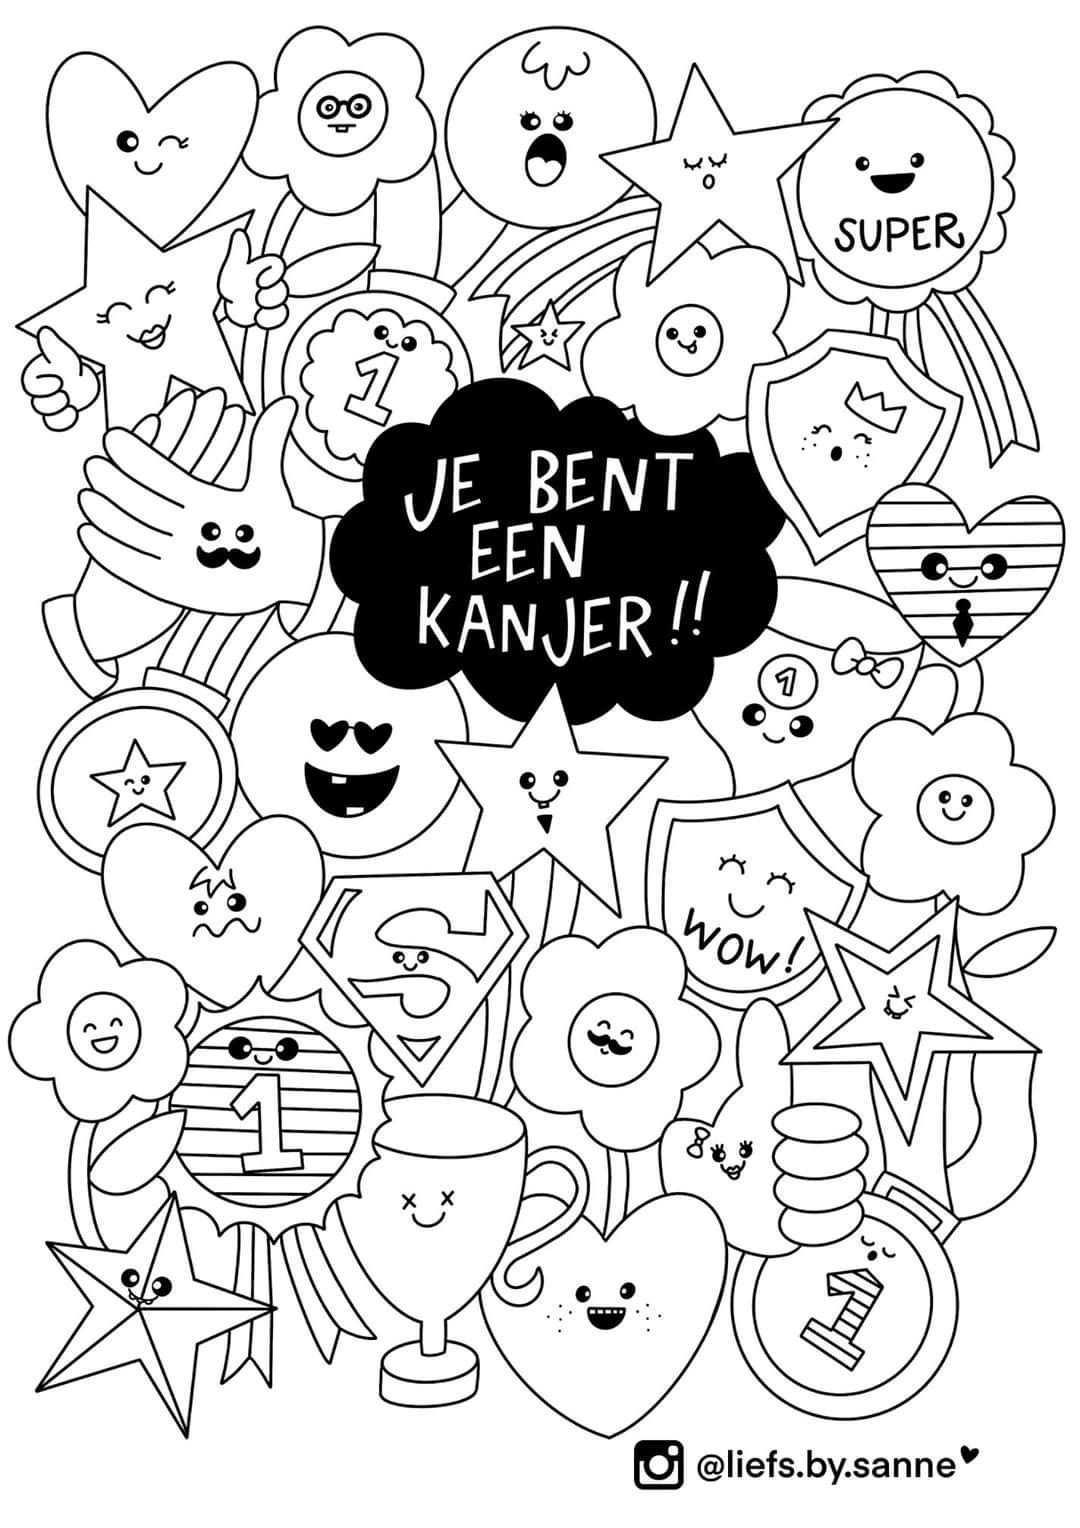 Kanjer Kleurplaat Kinderkleurplaten Krabbel Kunst Tekeningen Kleurplaten